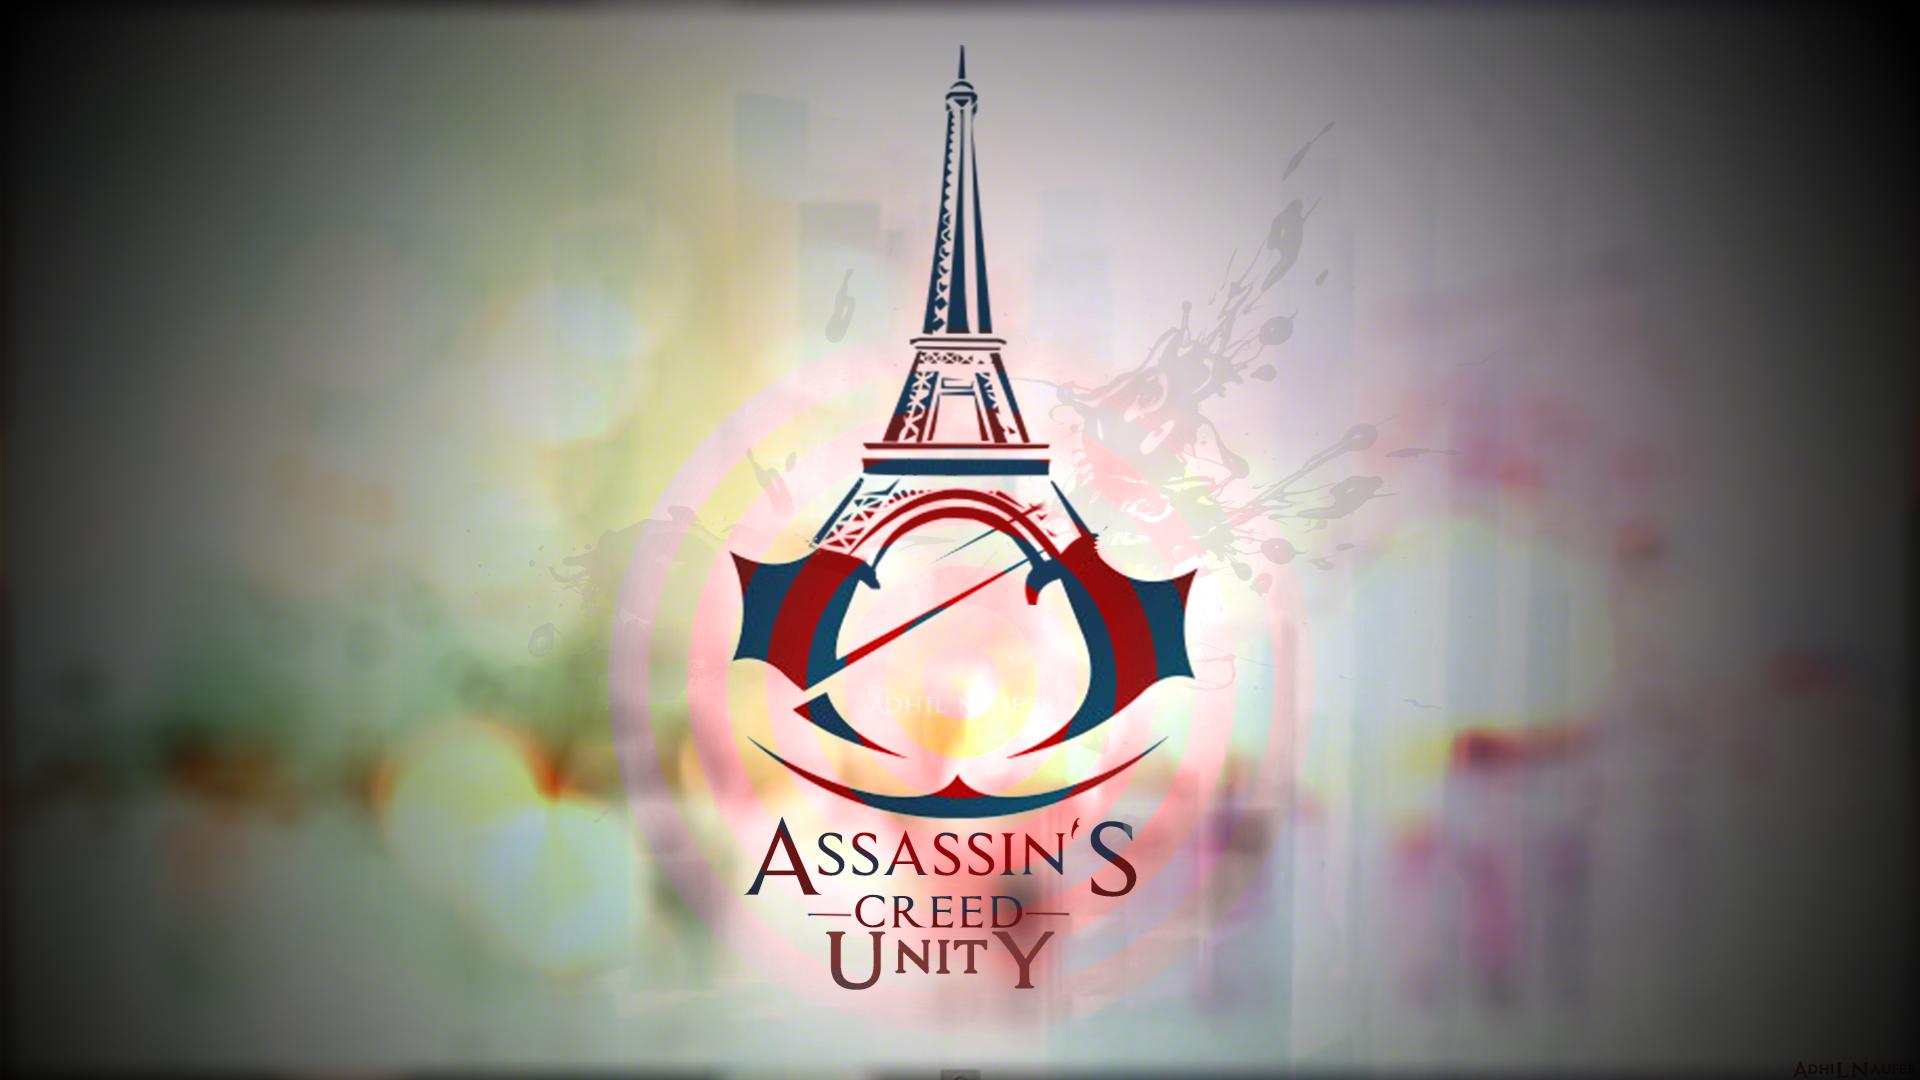 Assassins Creed Unity Assassins Creed 1920x1080